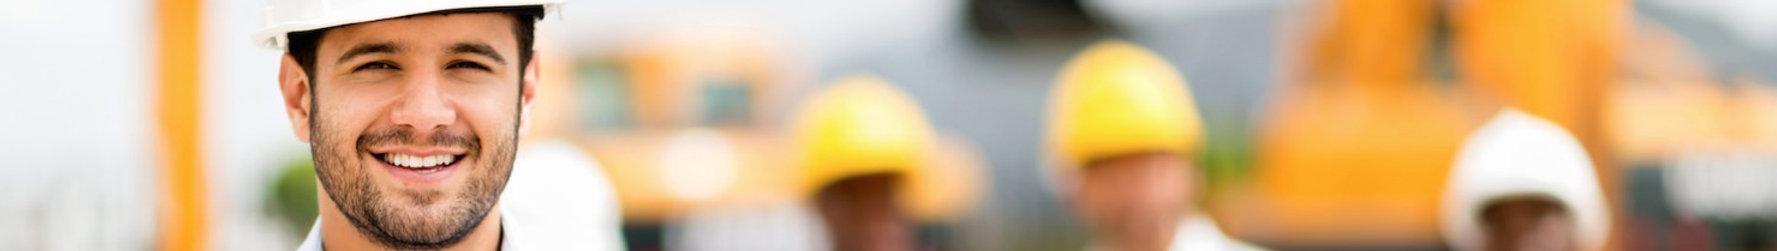 Online Safety Training - Forklift and Hazmat Training